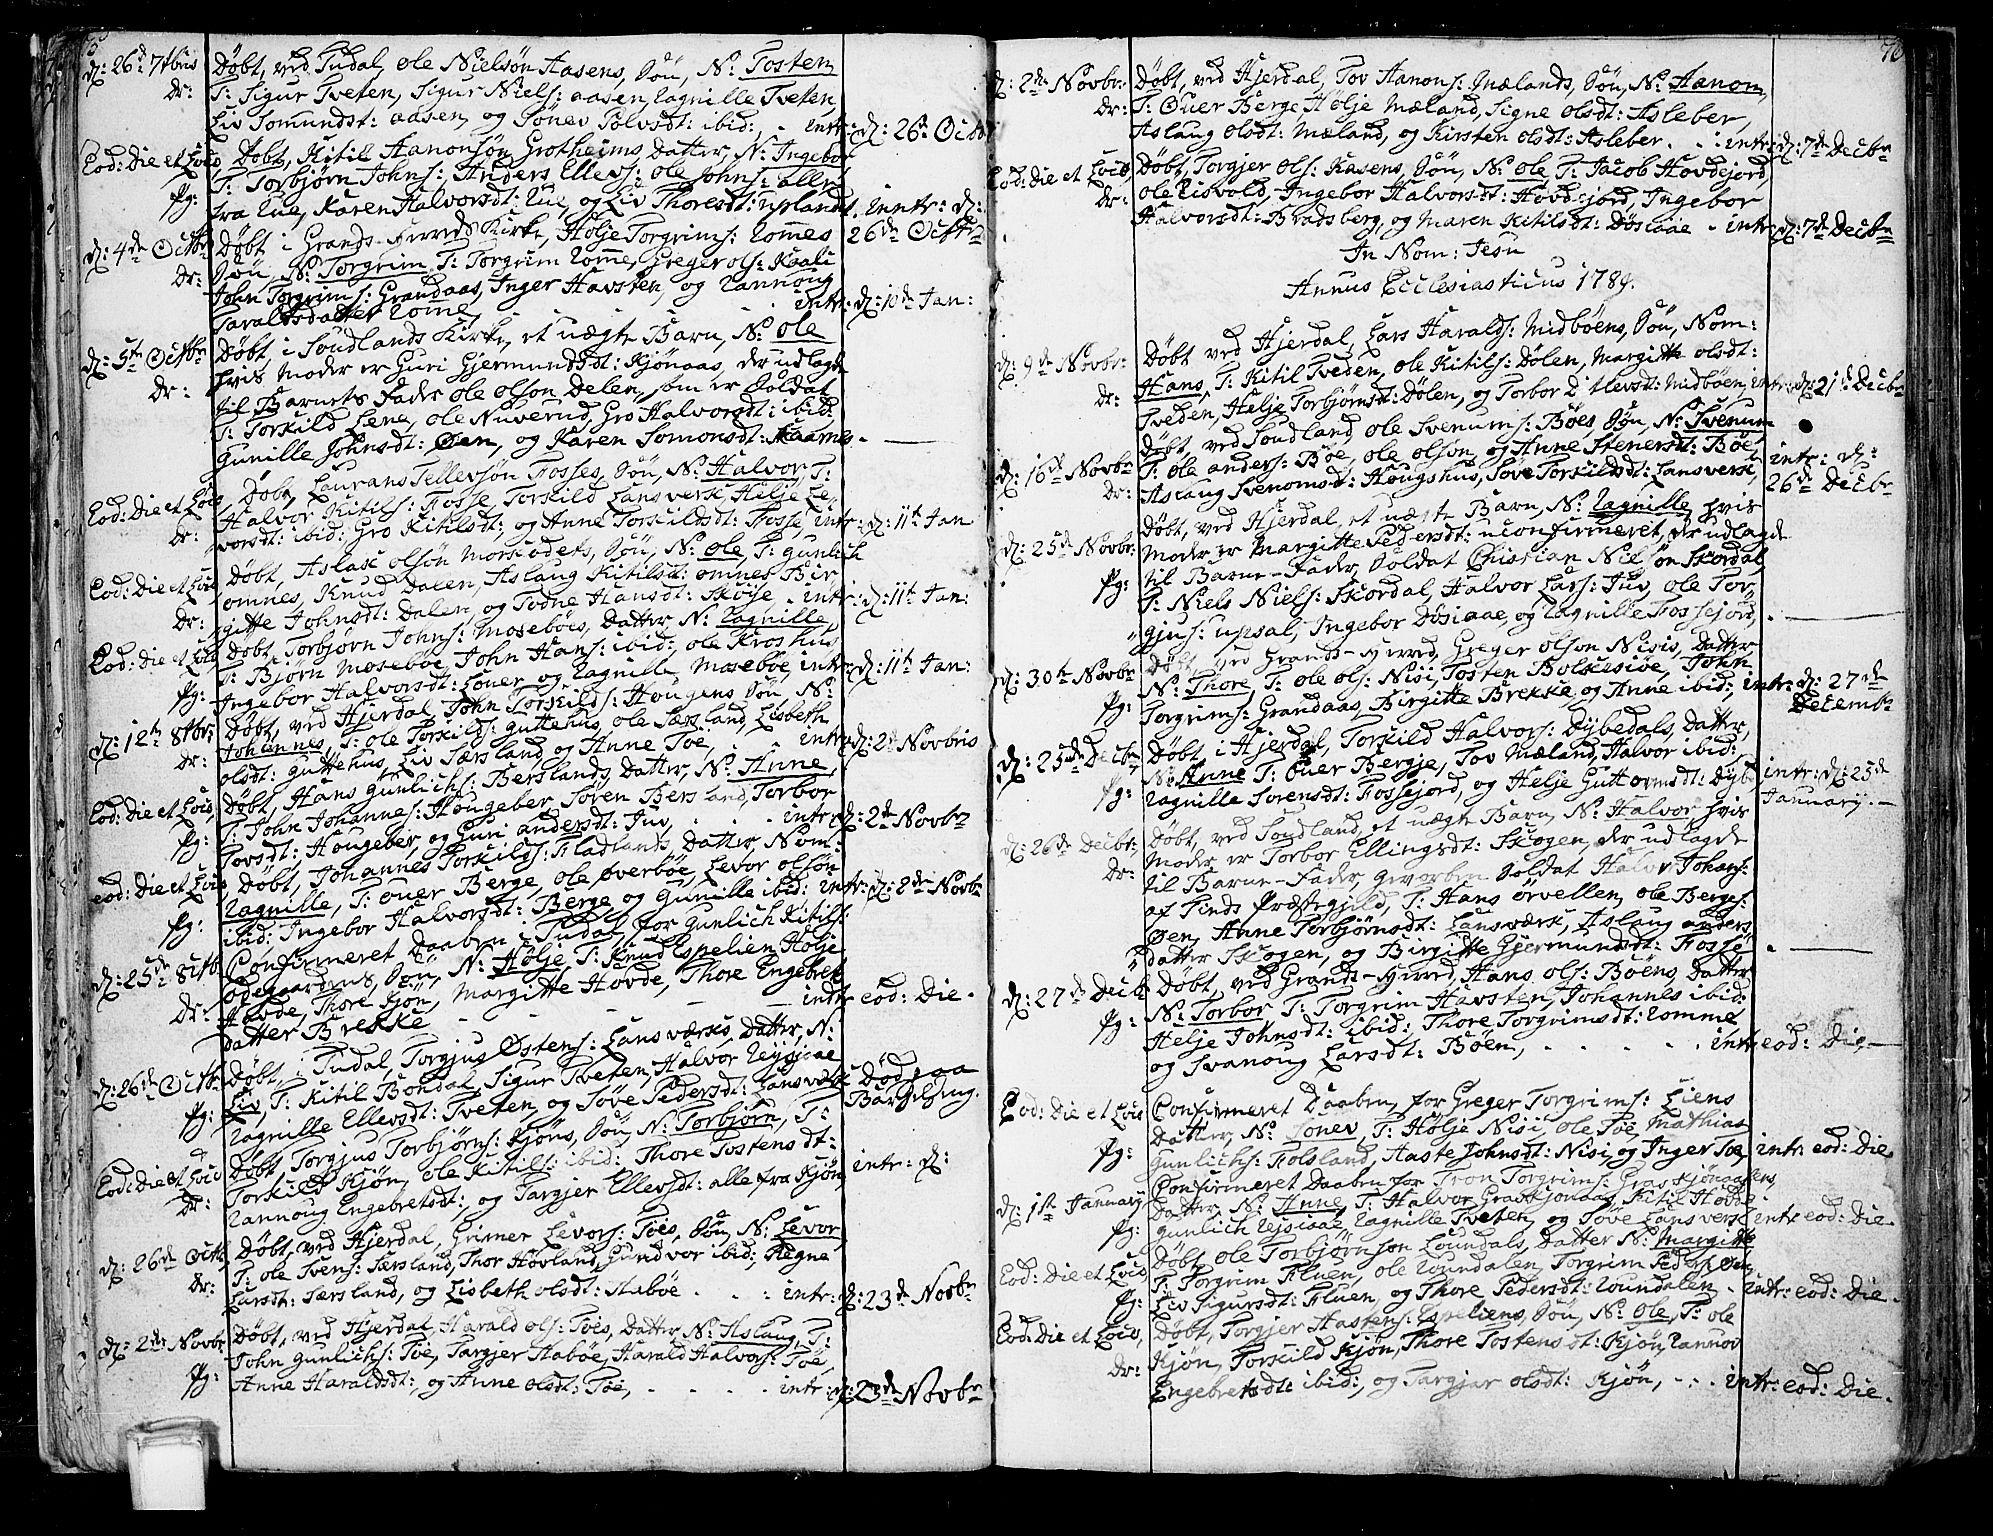 SAKO, Hjartdal kirkebøker, F/Fa/L0005: Ministerialbok nr. I 5, 1776-1801, s. 75-76